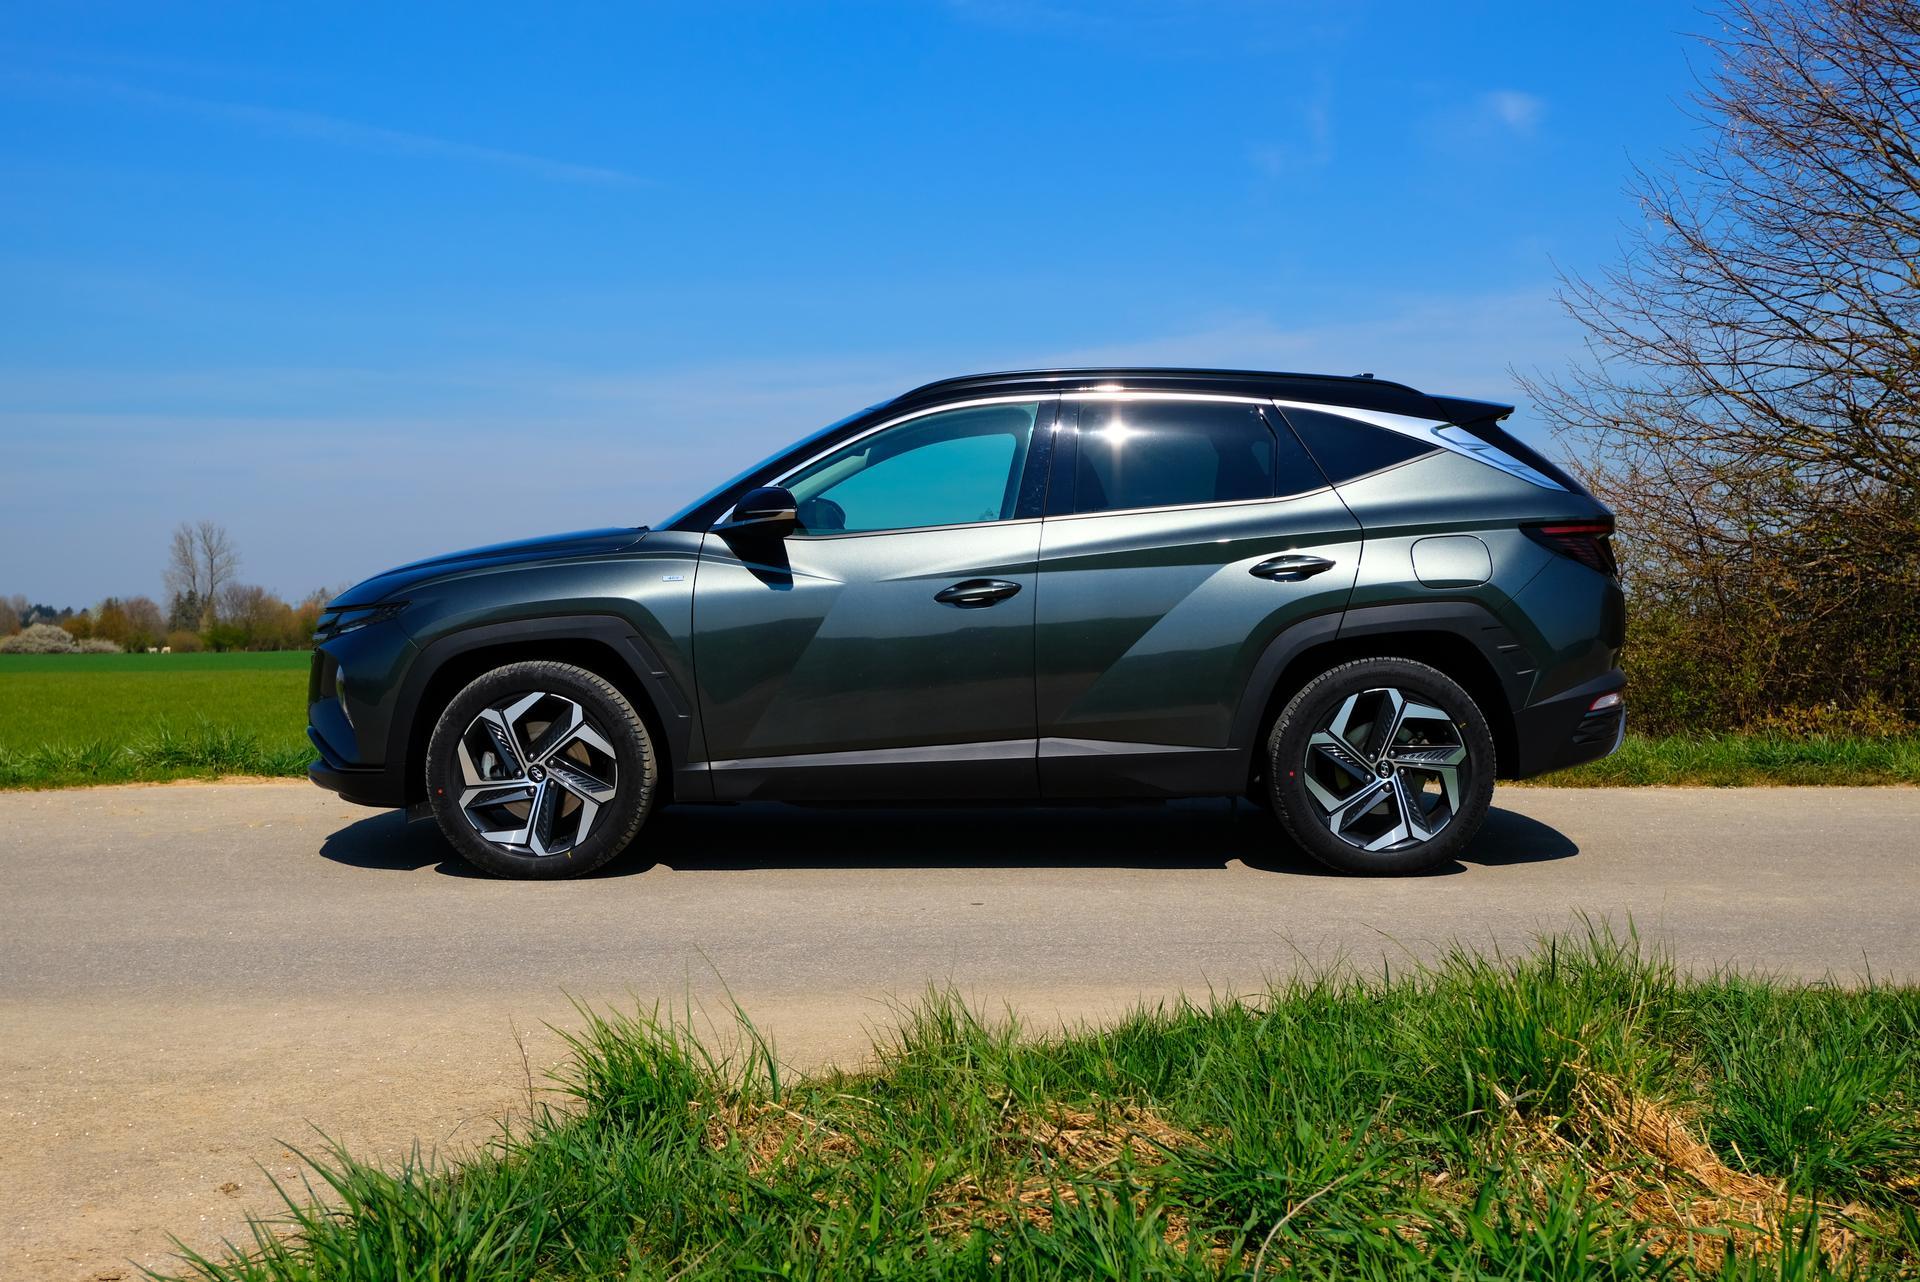 Hyundai Tucson 1.6 T-GDI HEV 4x4 2021